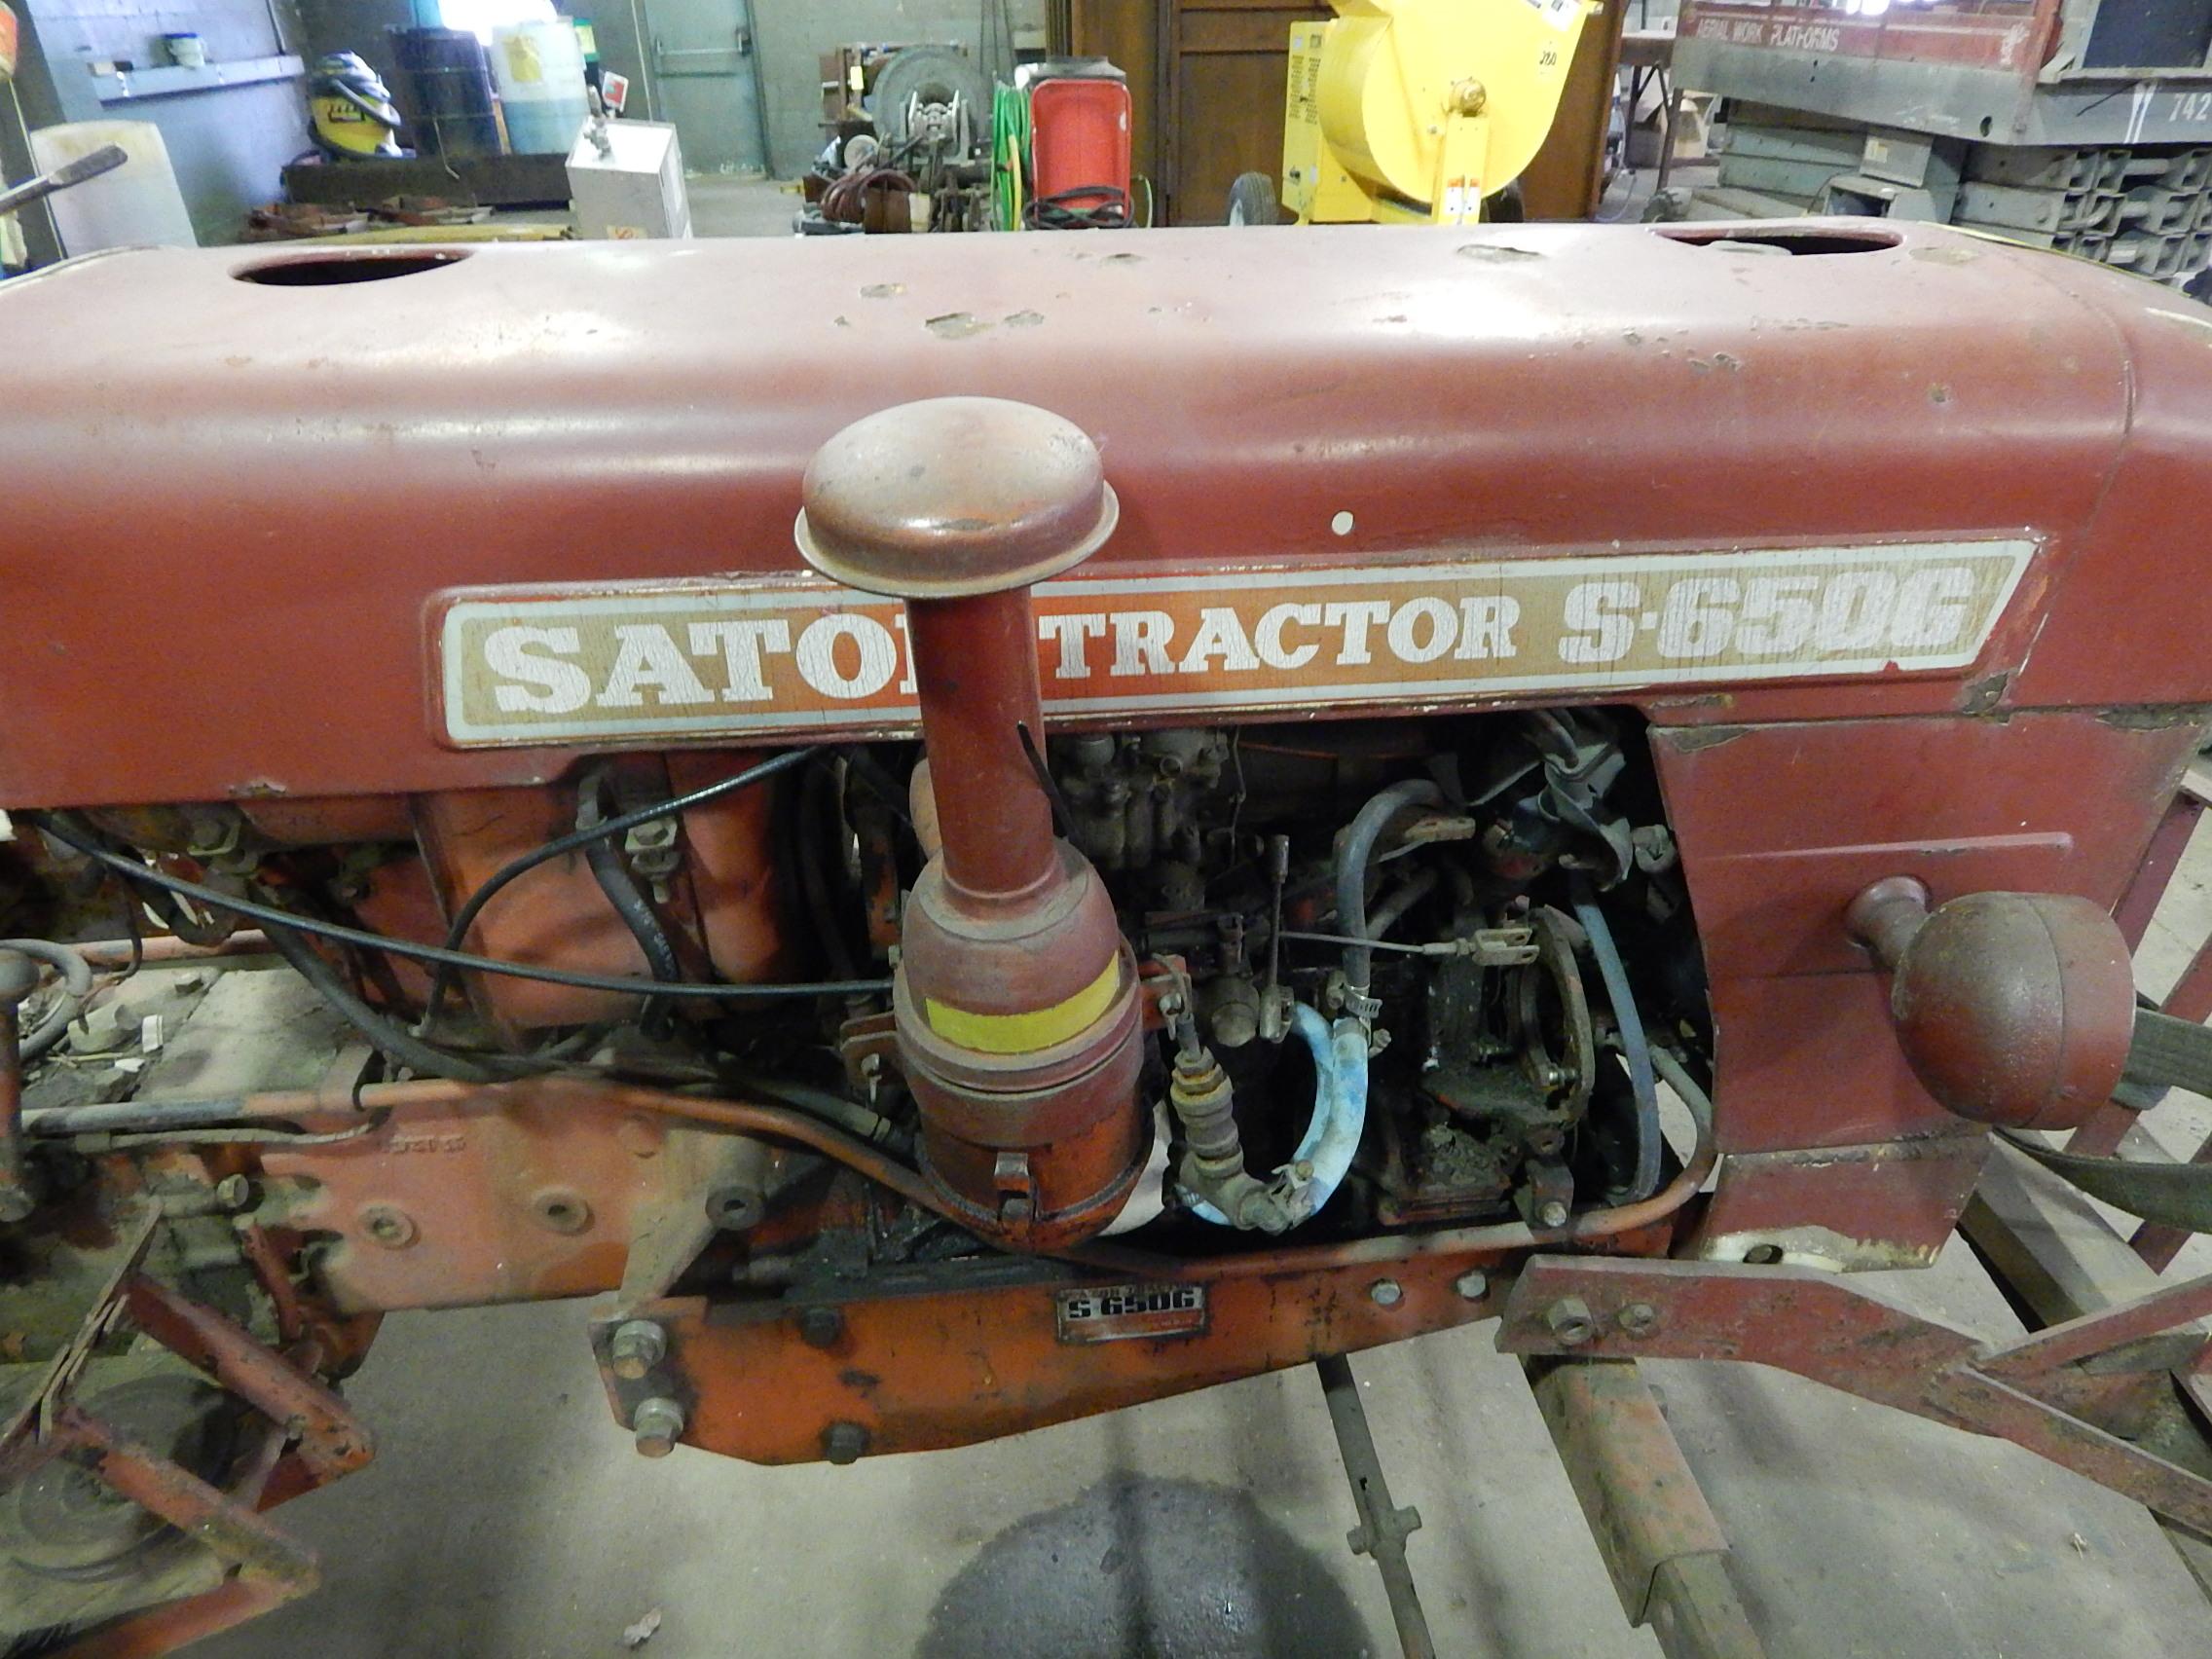 satoh tractor 4 cylinder engine diagram satoh model s-650g tractor, 4 cylinder gas engine, 2 wd ... #8